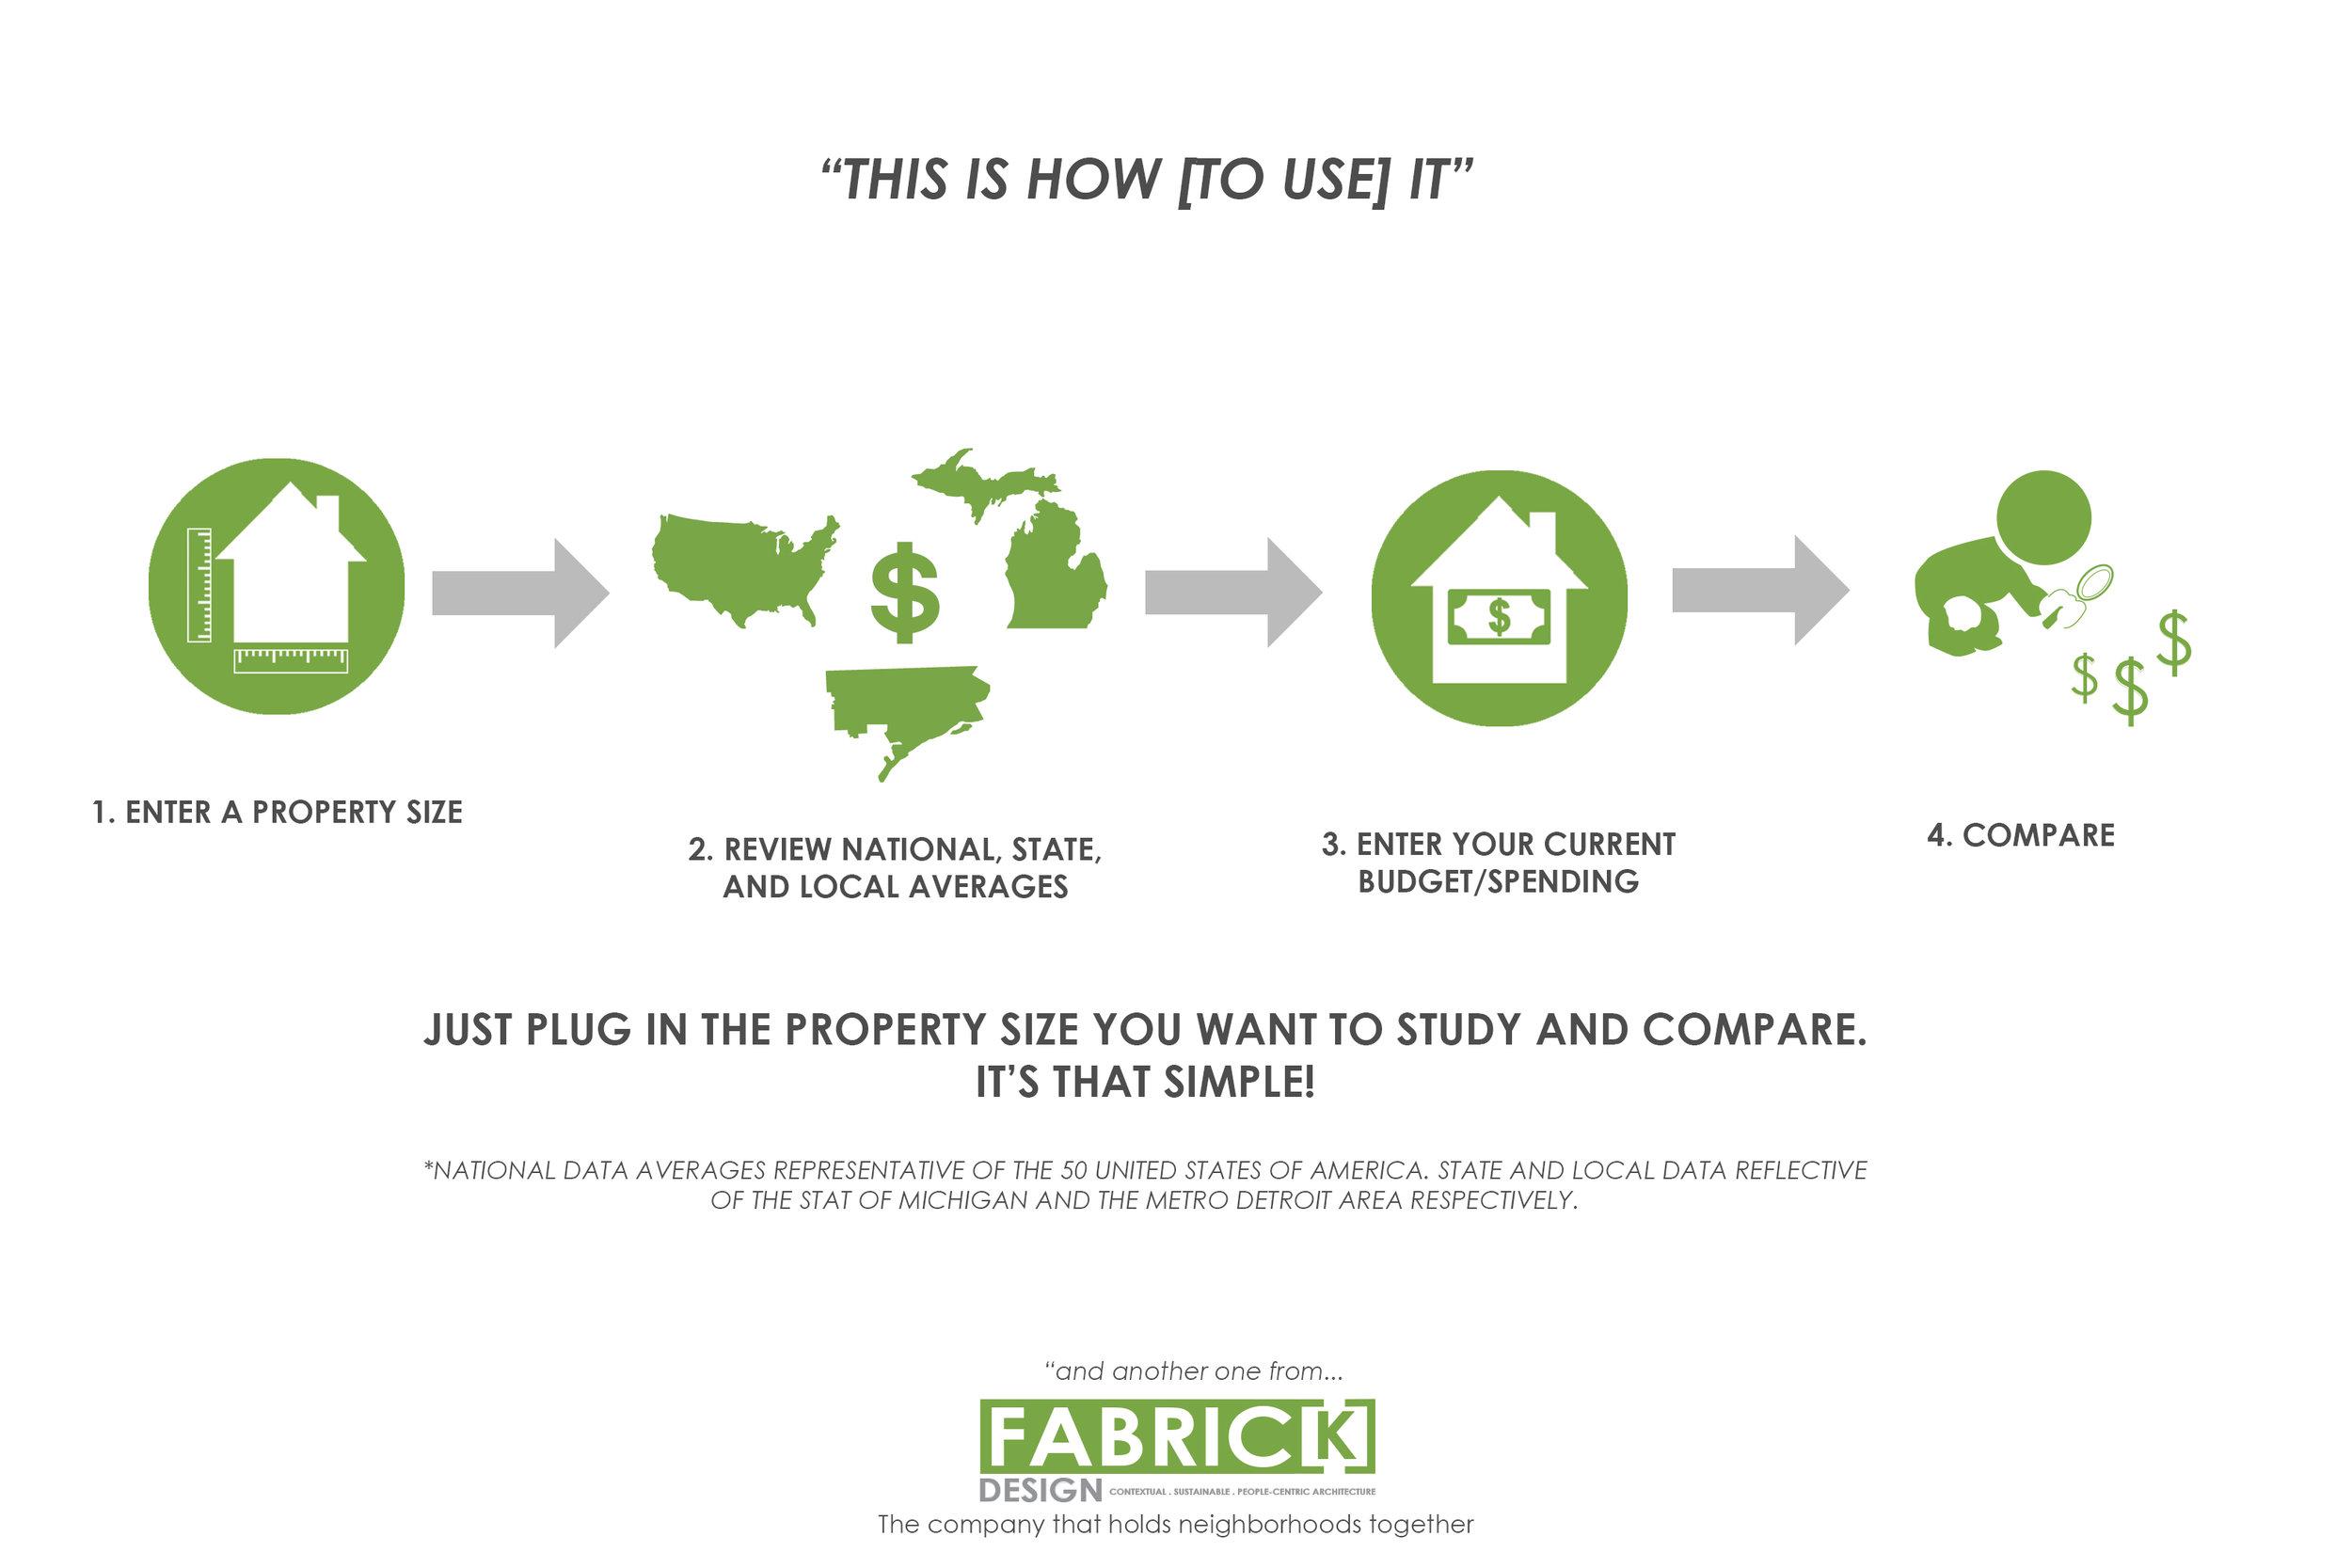 Fabrick Design_CostEstimator_UseDiagram.jpg